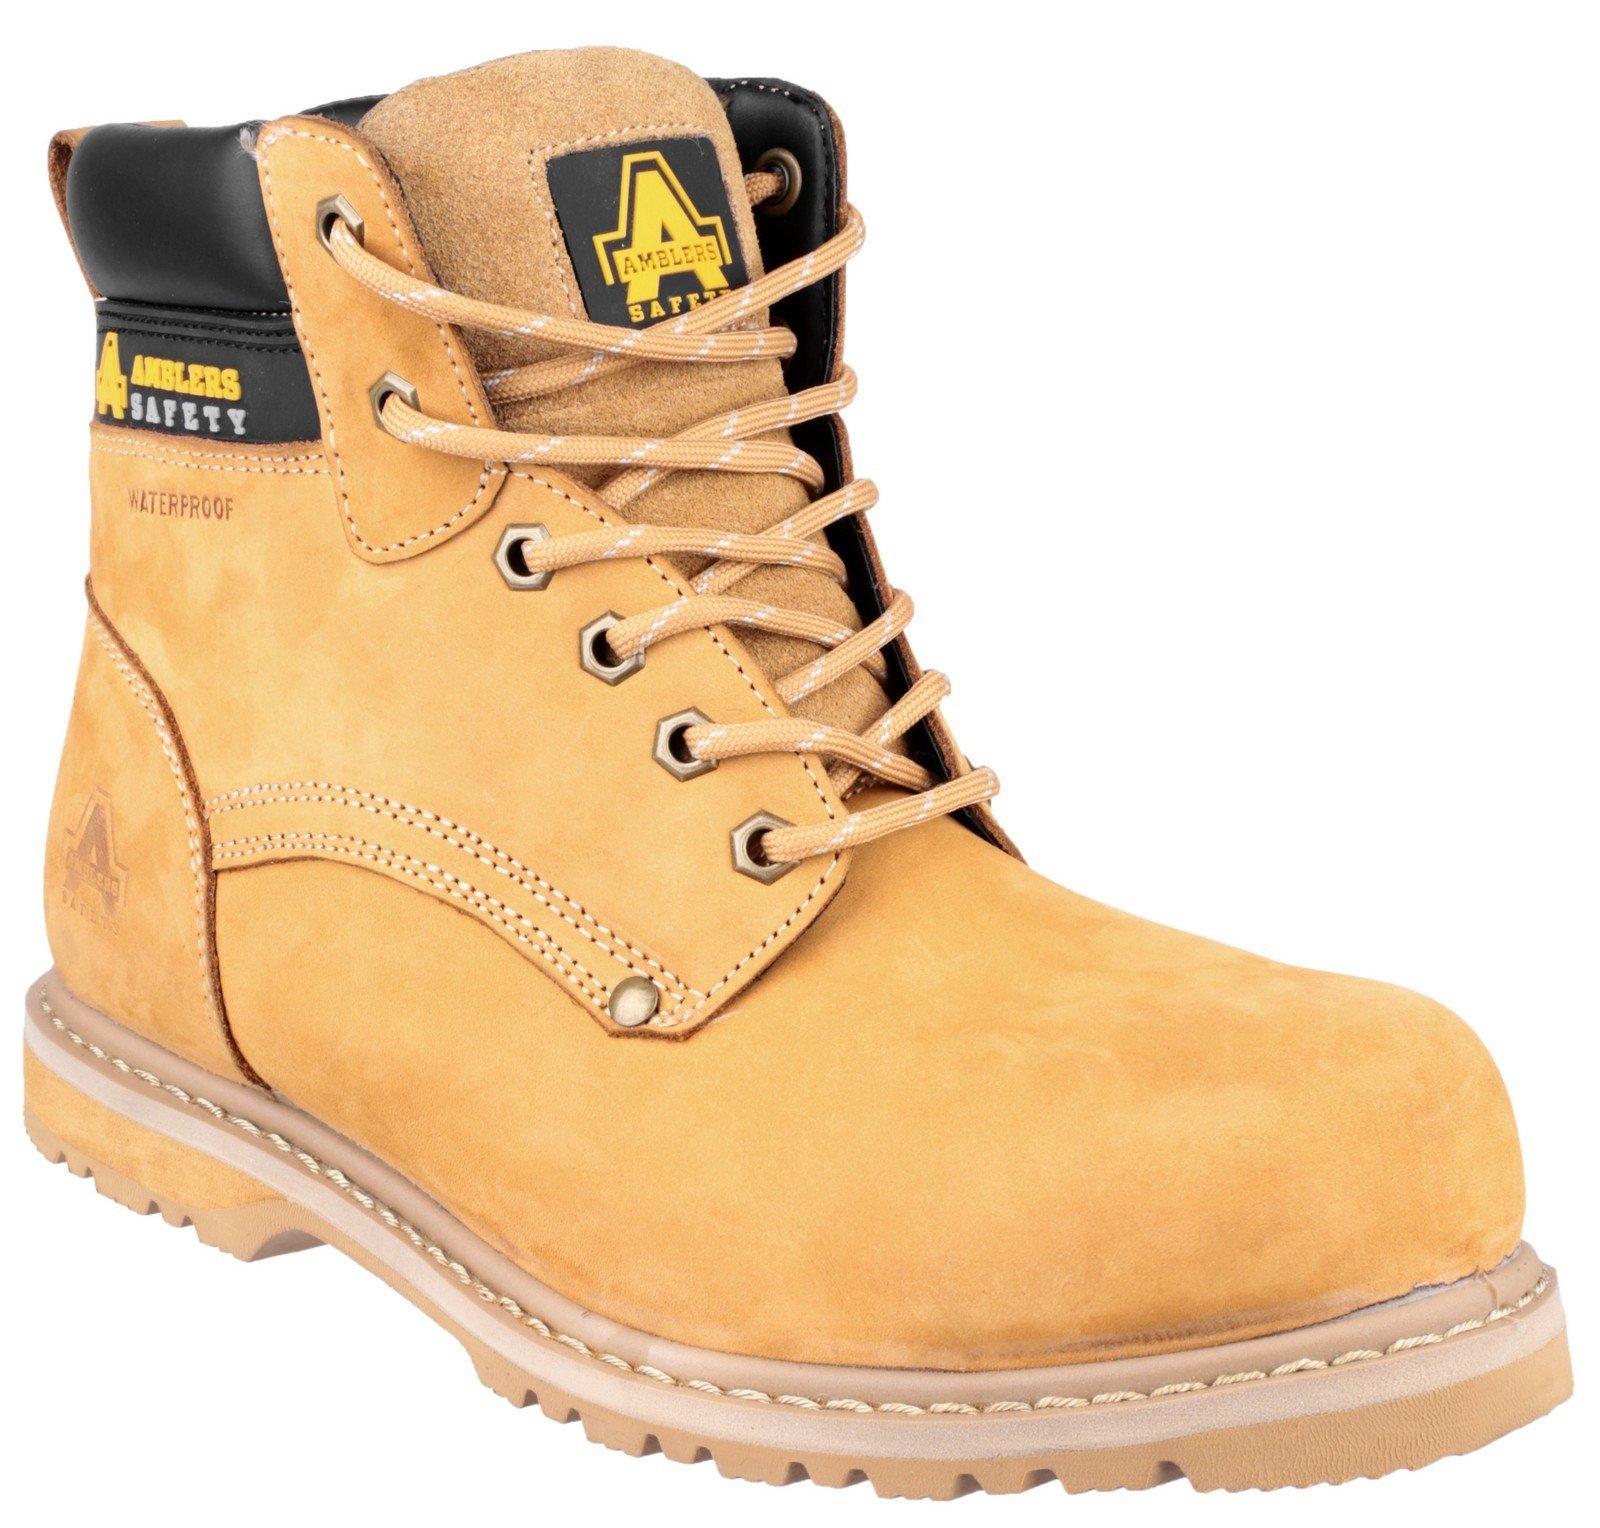 Amblers Unisex Safety 147 Welted Safety Boot Honey 24886 - Honey 6